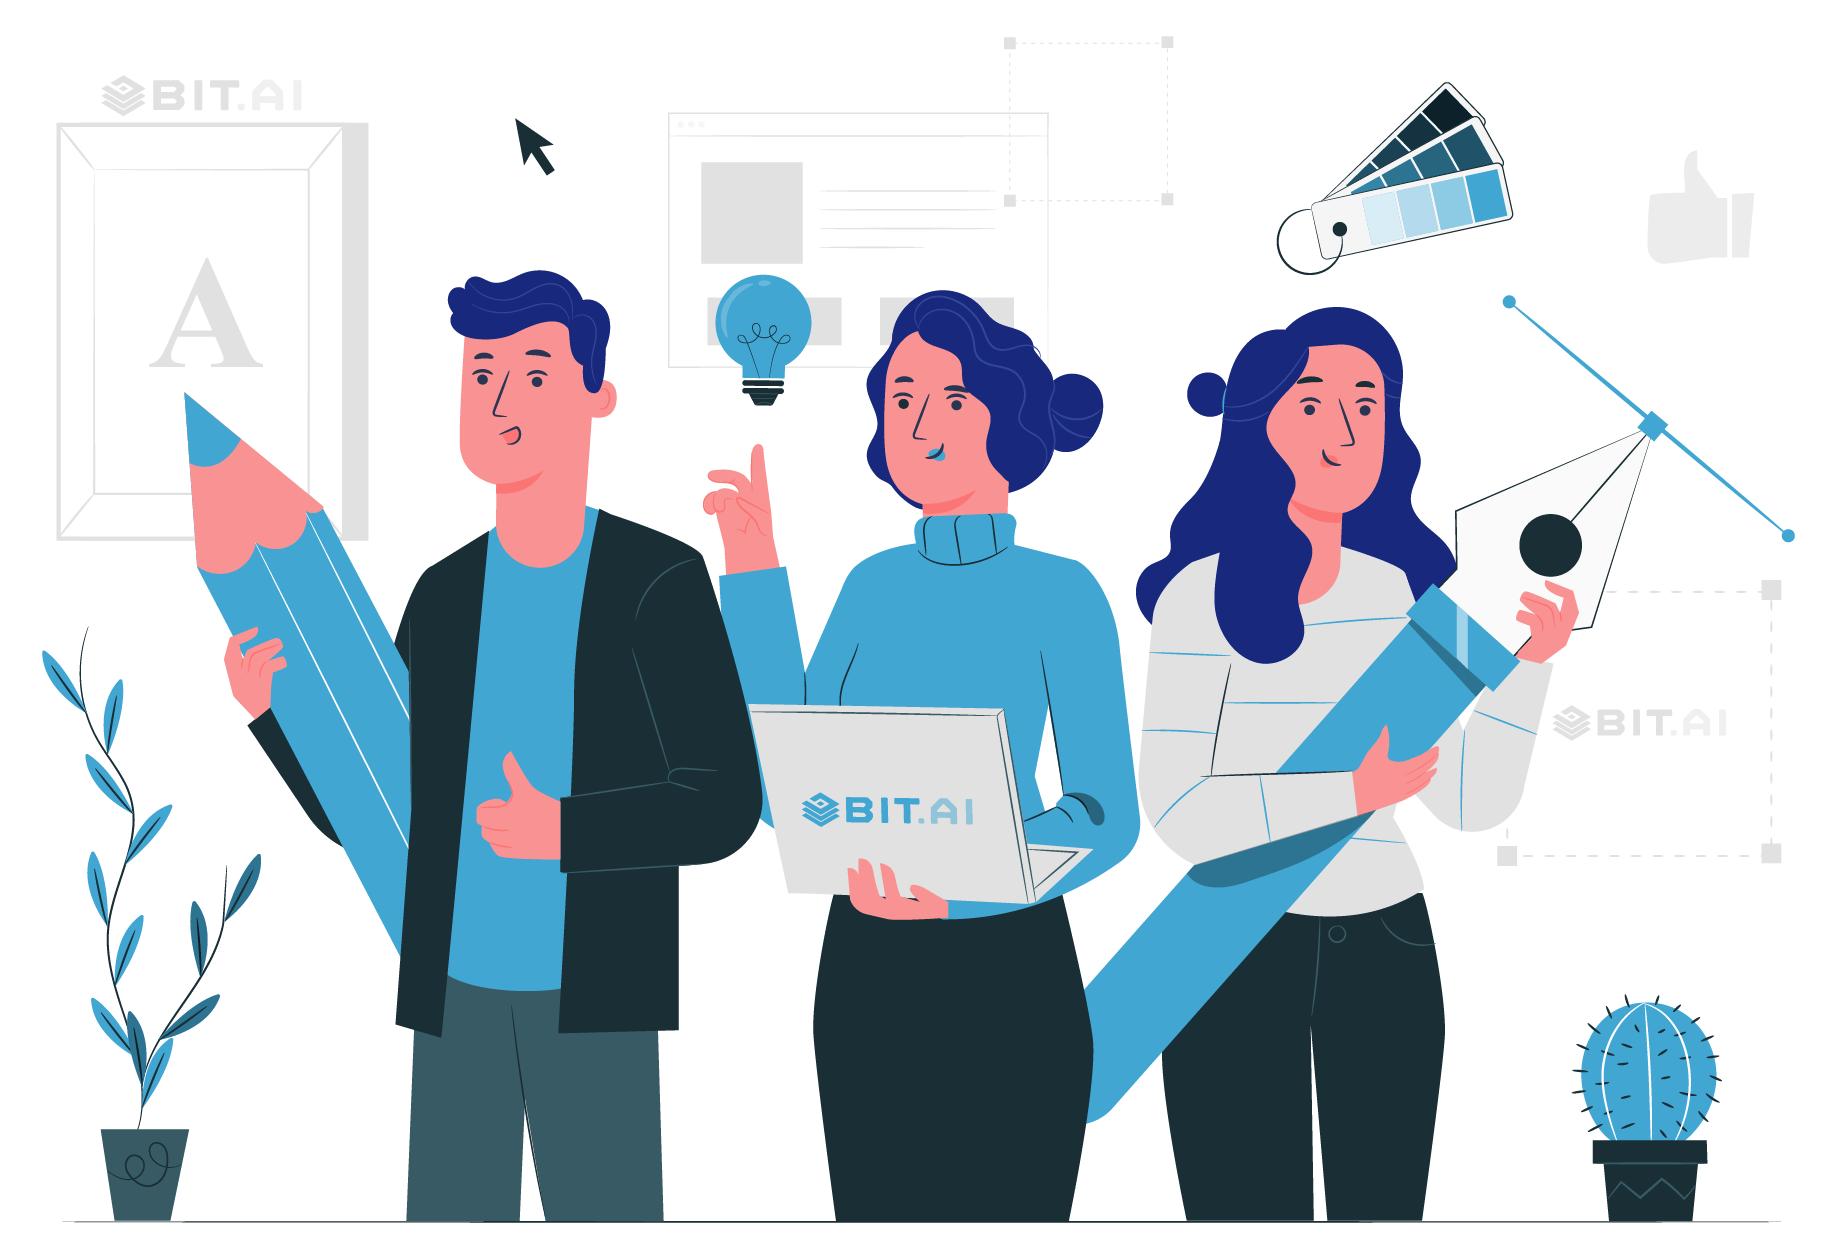 Graphic design as online business idea